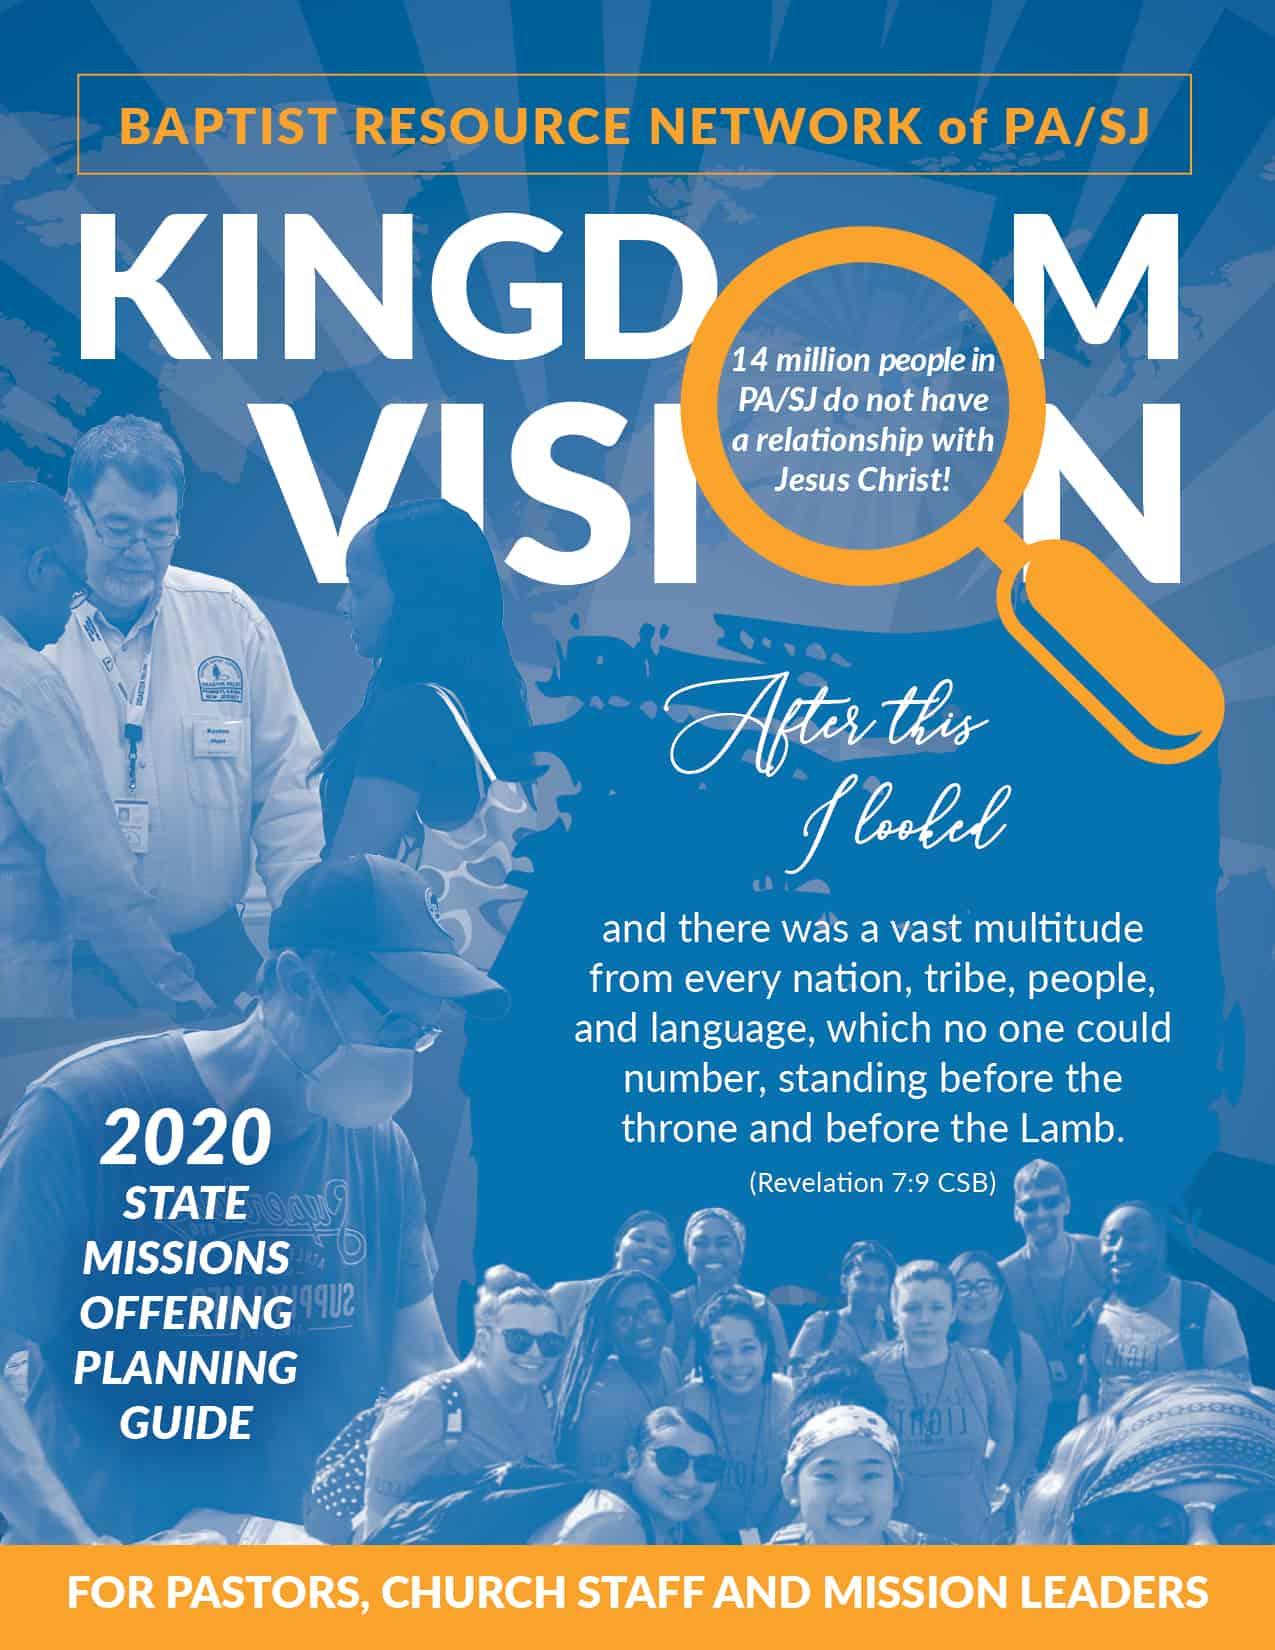 SMO Planning Guide-Kingdom Vision